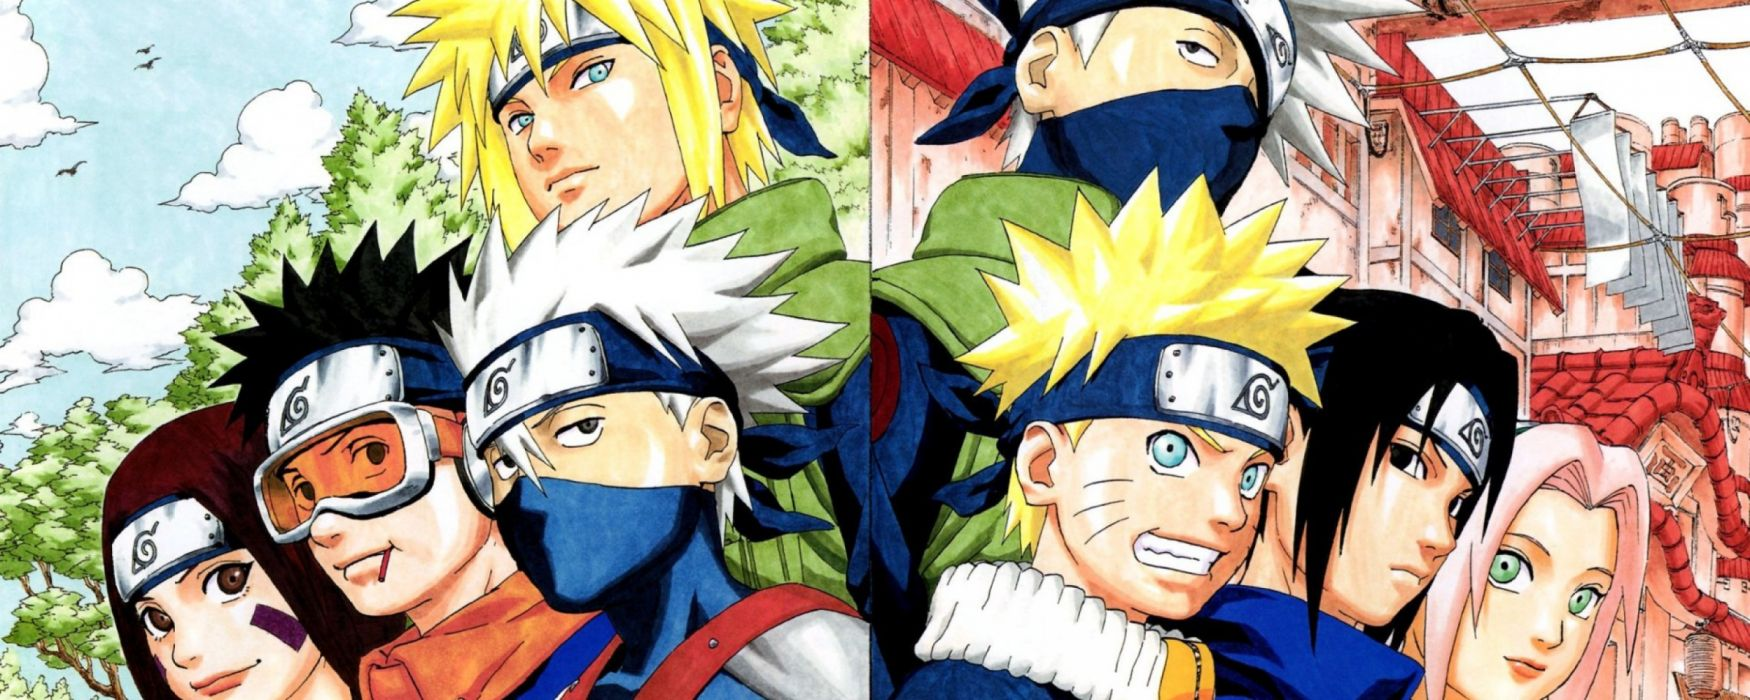 Naruto Dual Screen Wallpapers Top Free Naruto Dual Screen